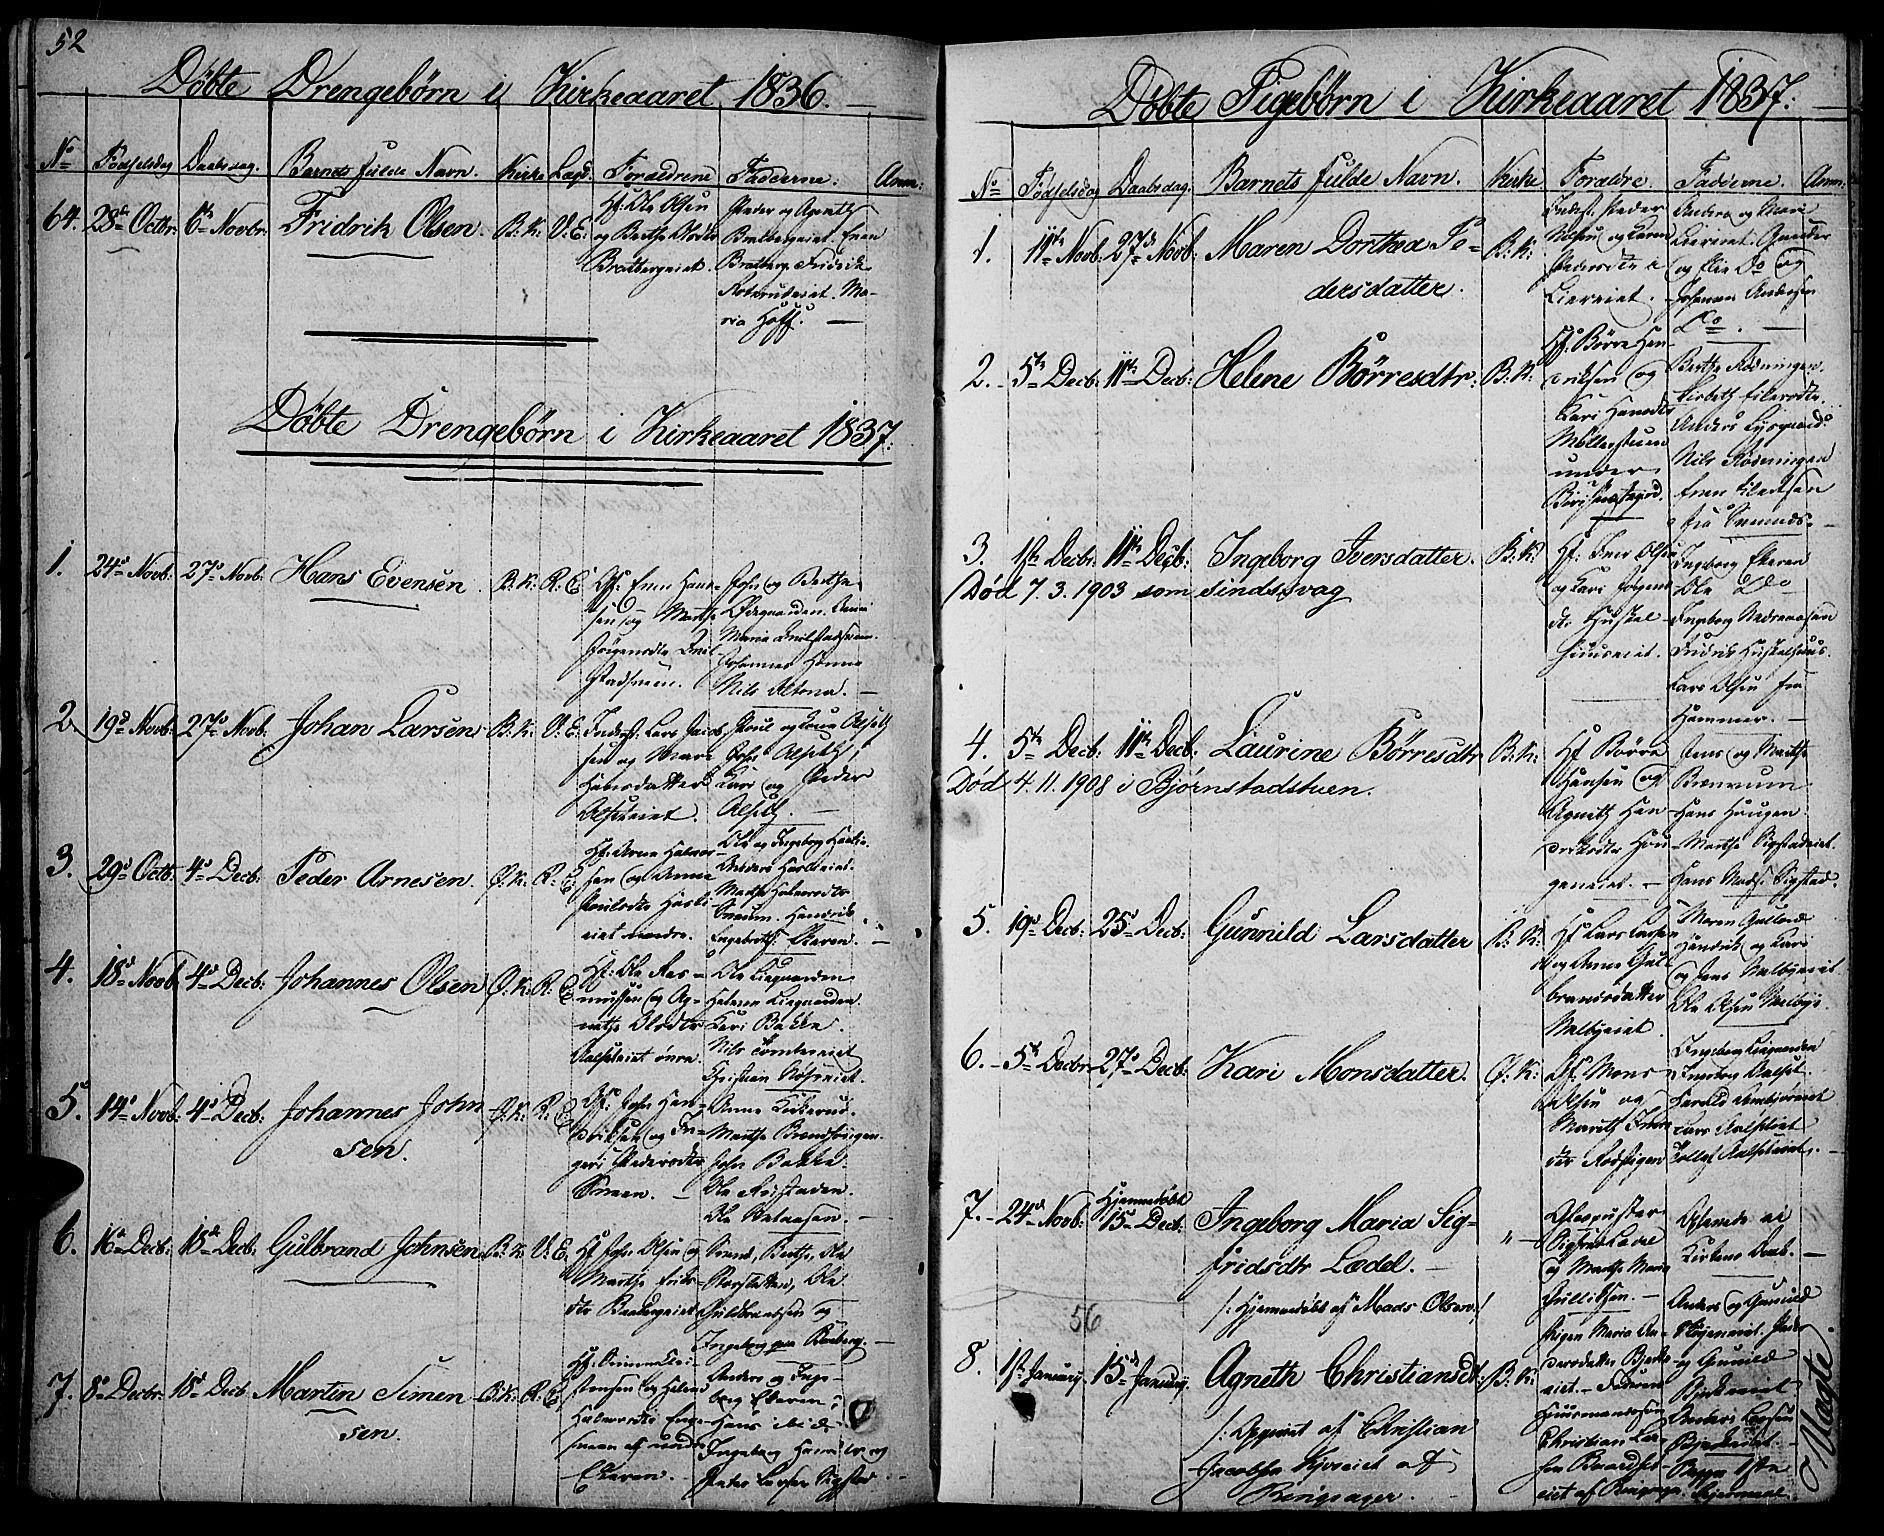 SAH, Biri prestekontor, Ministerialbok nr. 4, 1829-1842, s. 52